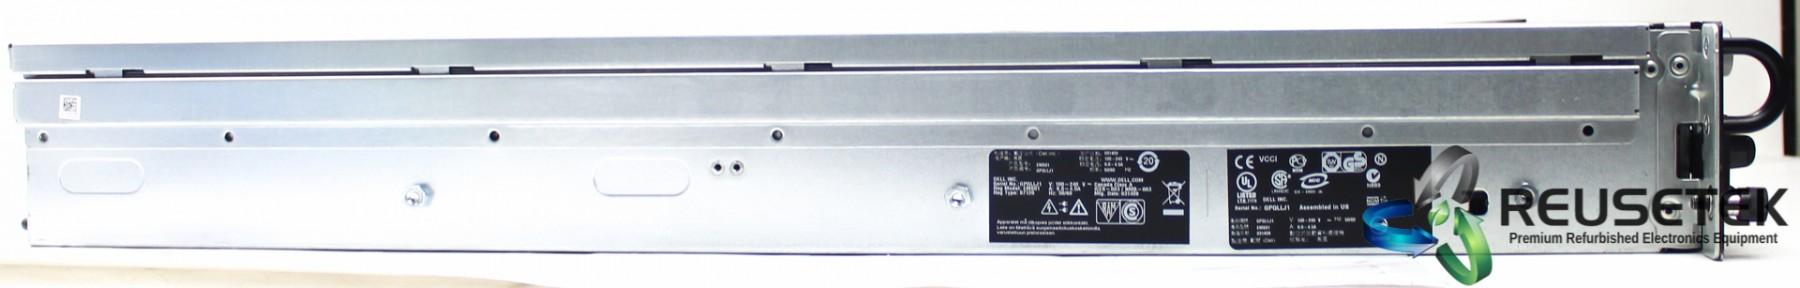 CDH5002-Dell PowerEdge 2950 III Rack Server-image